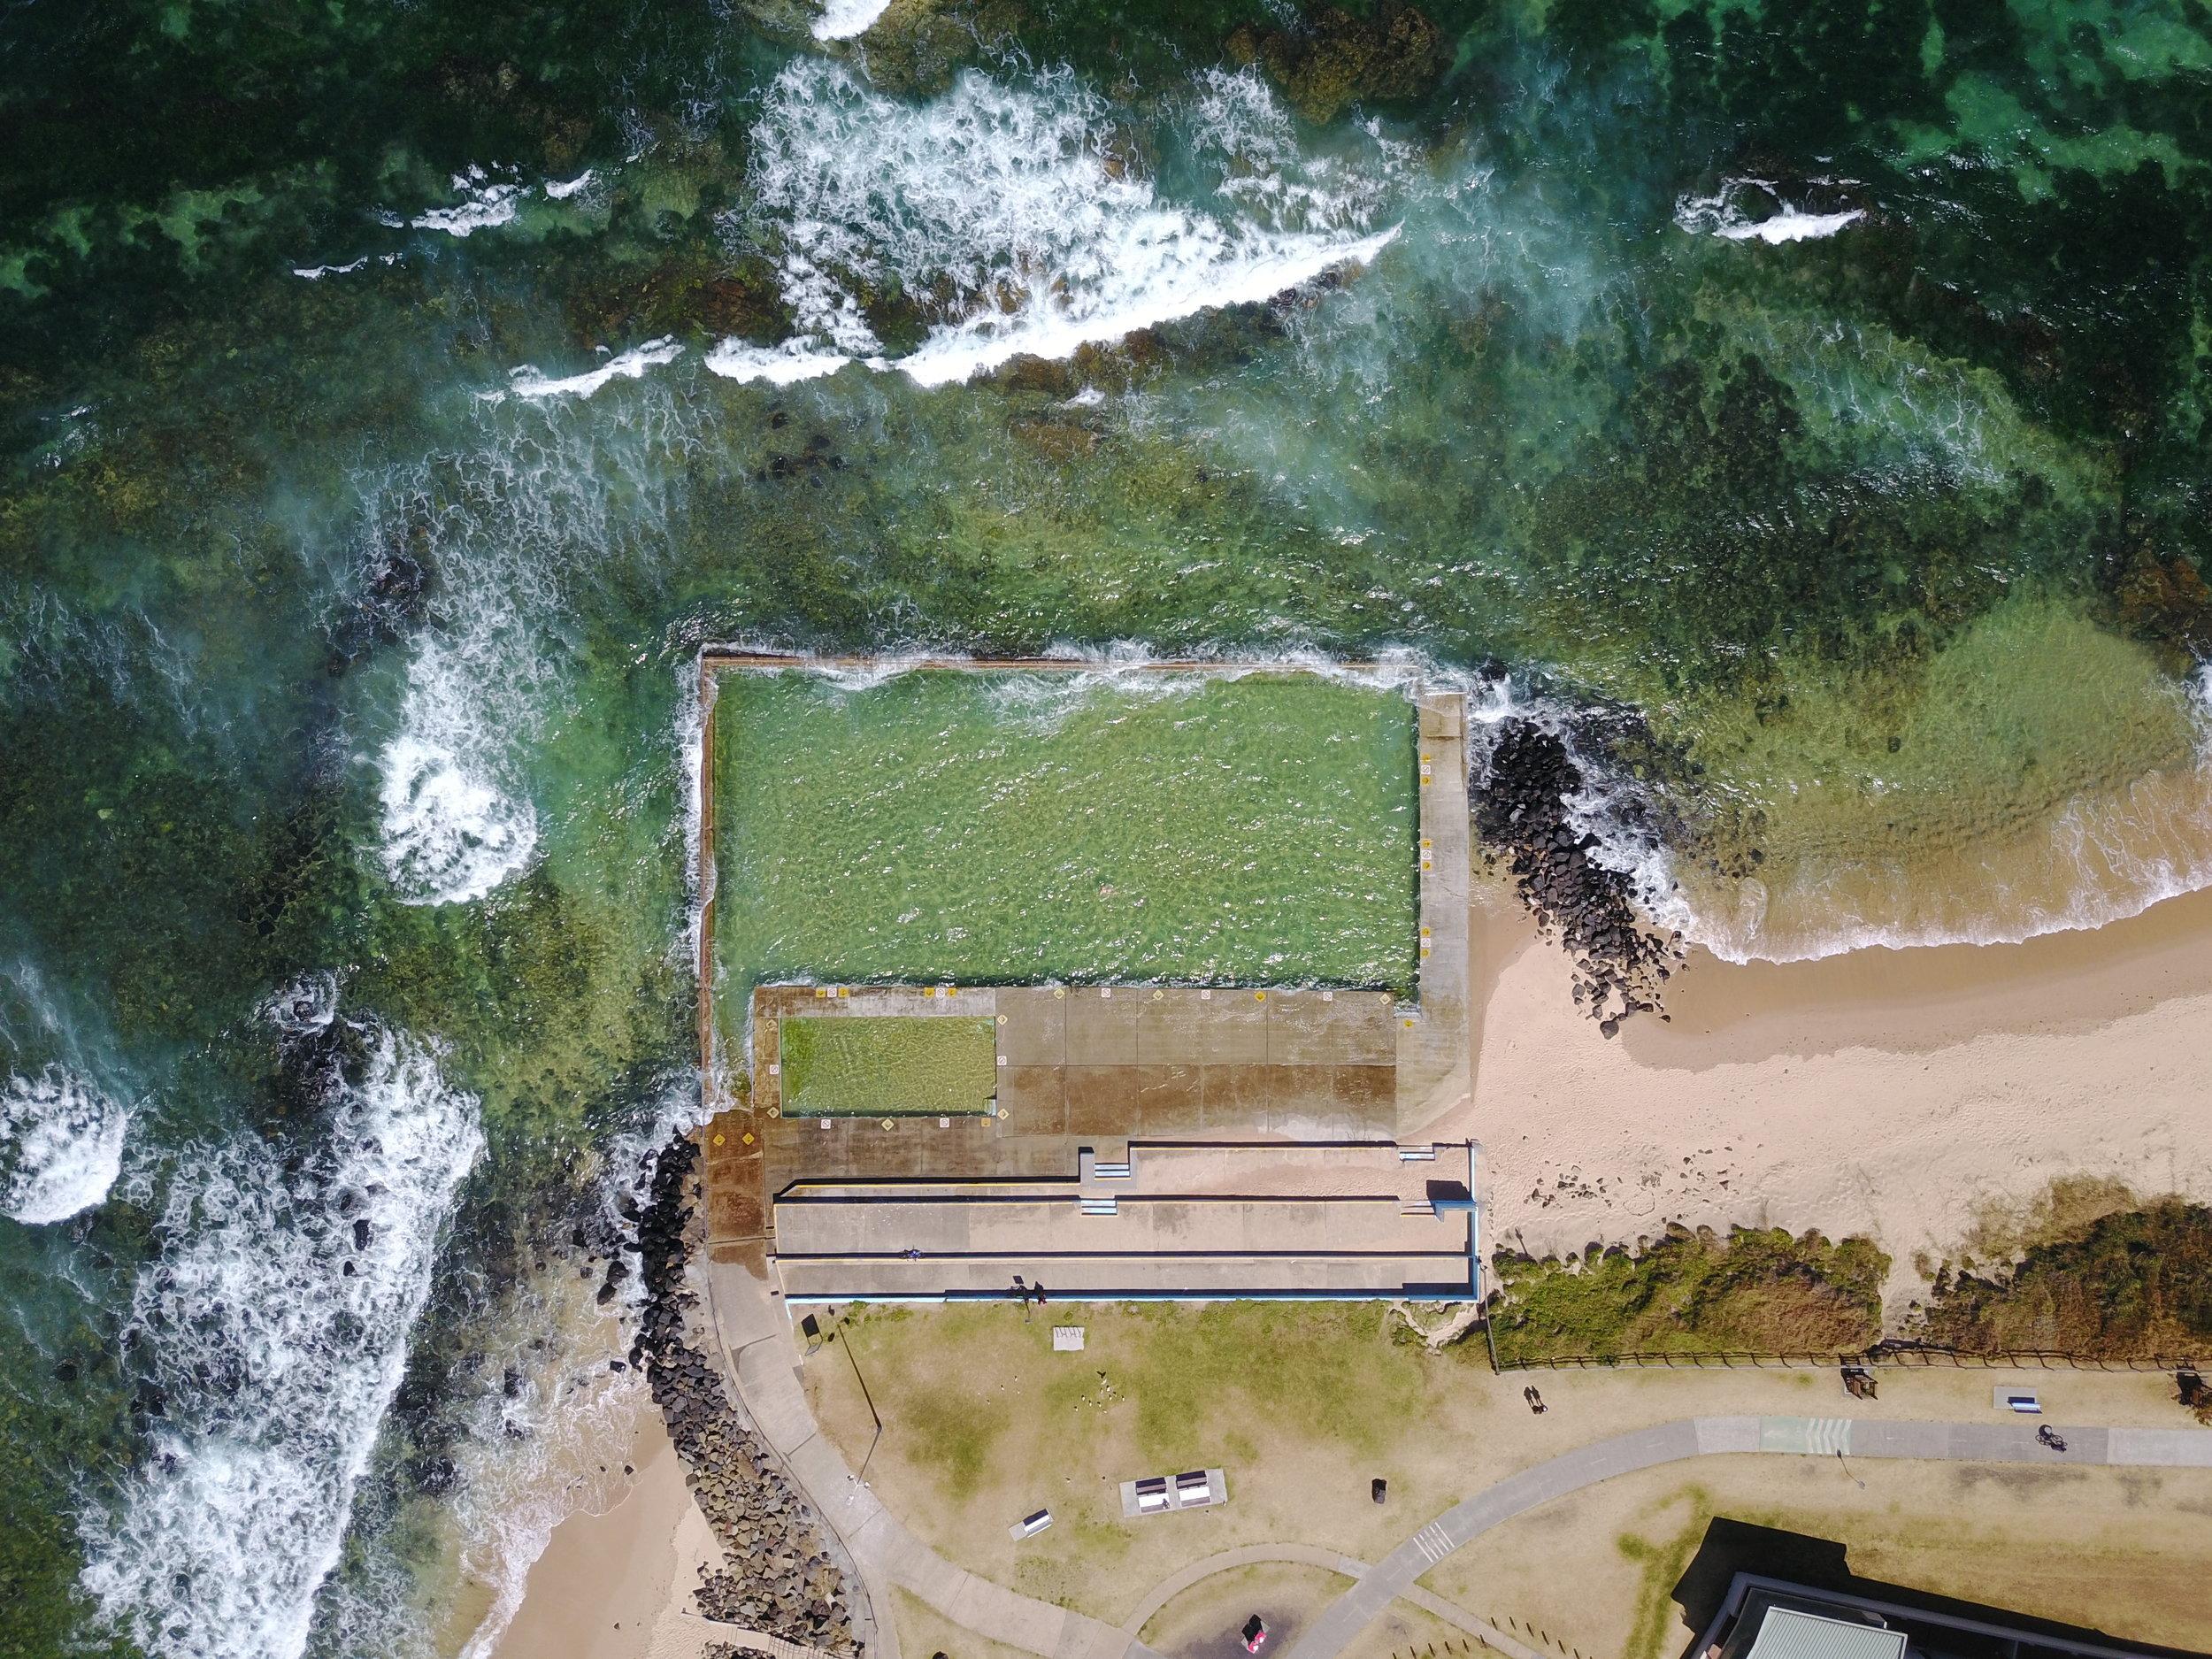 towradgi - towradgi ocean pool, nsw